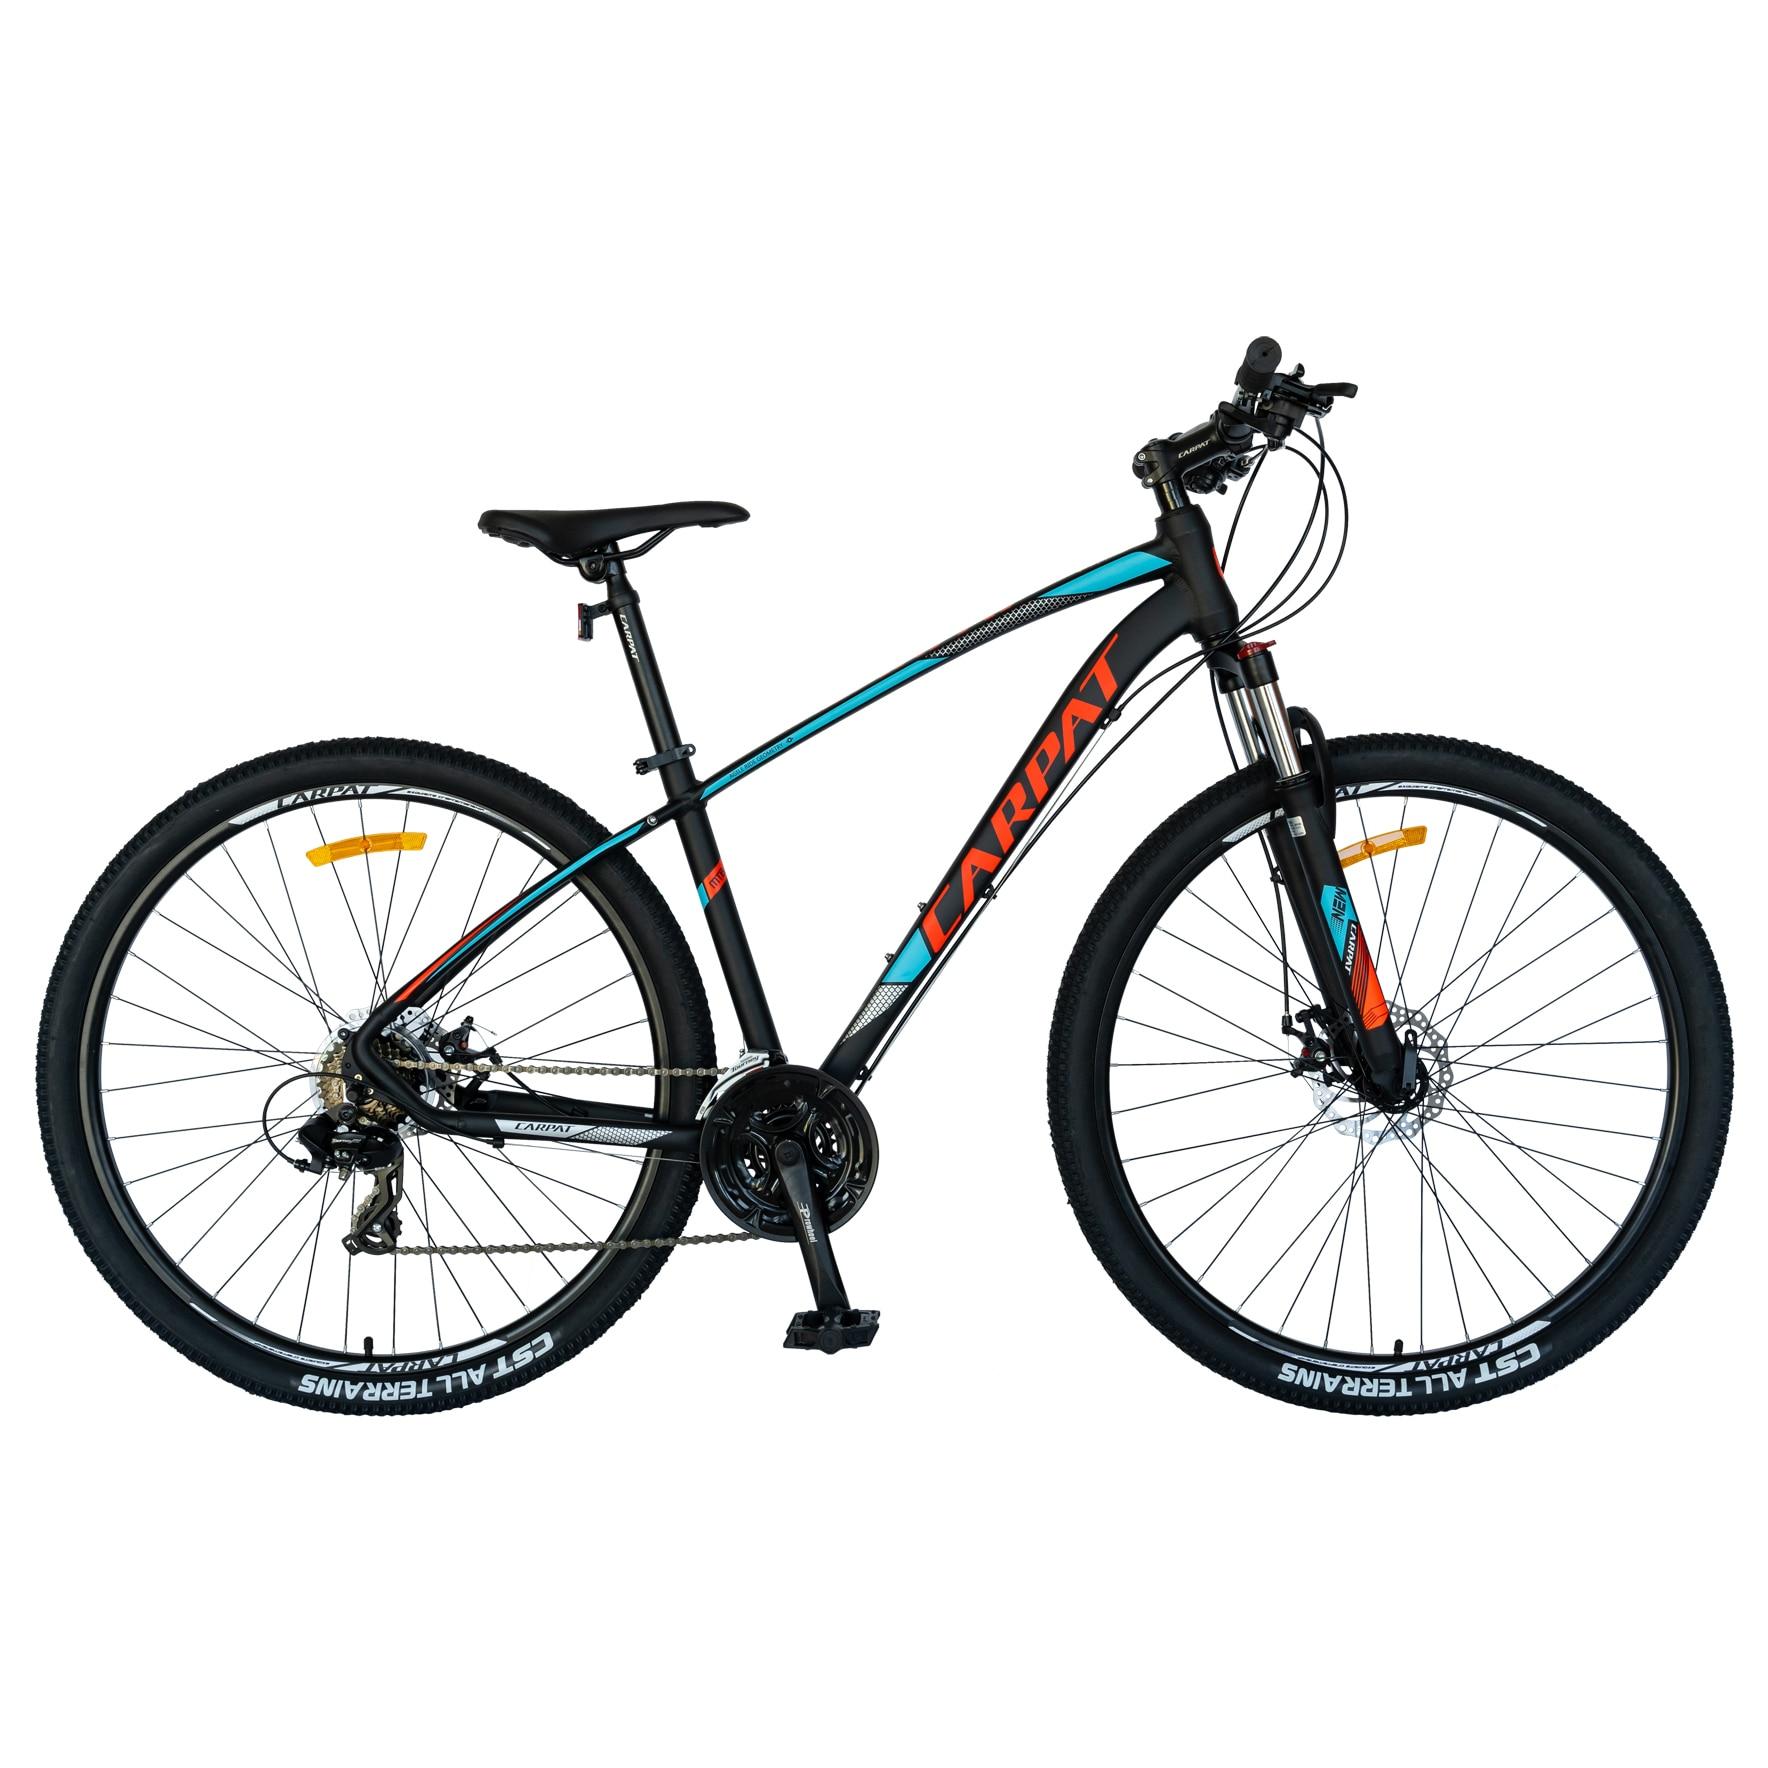 Fotografie Bicicleta MTB 29-er Carpat C2957C frana disc, transmisie Shimano, Negru Albastru